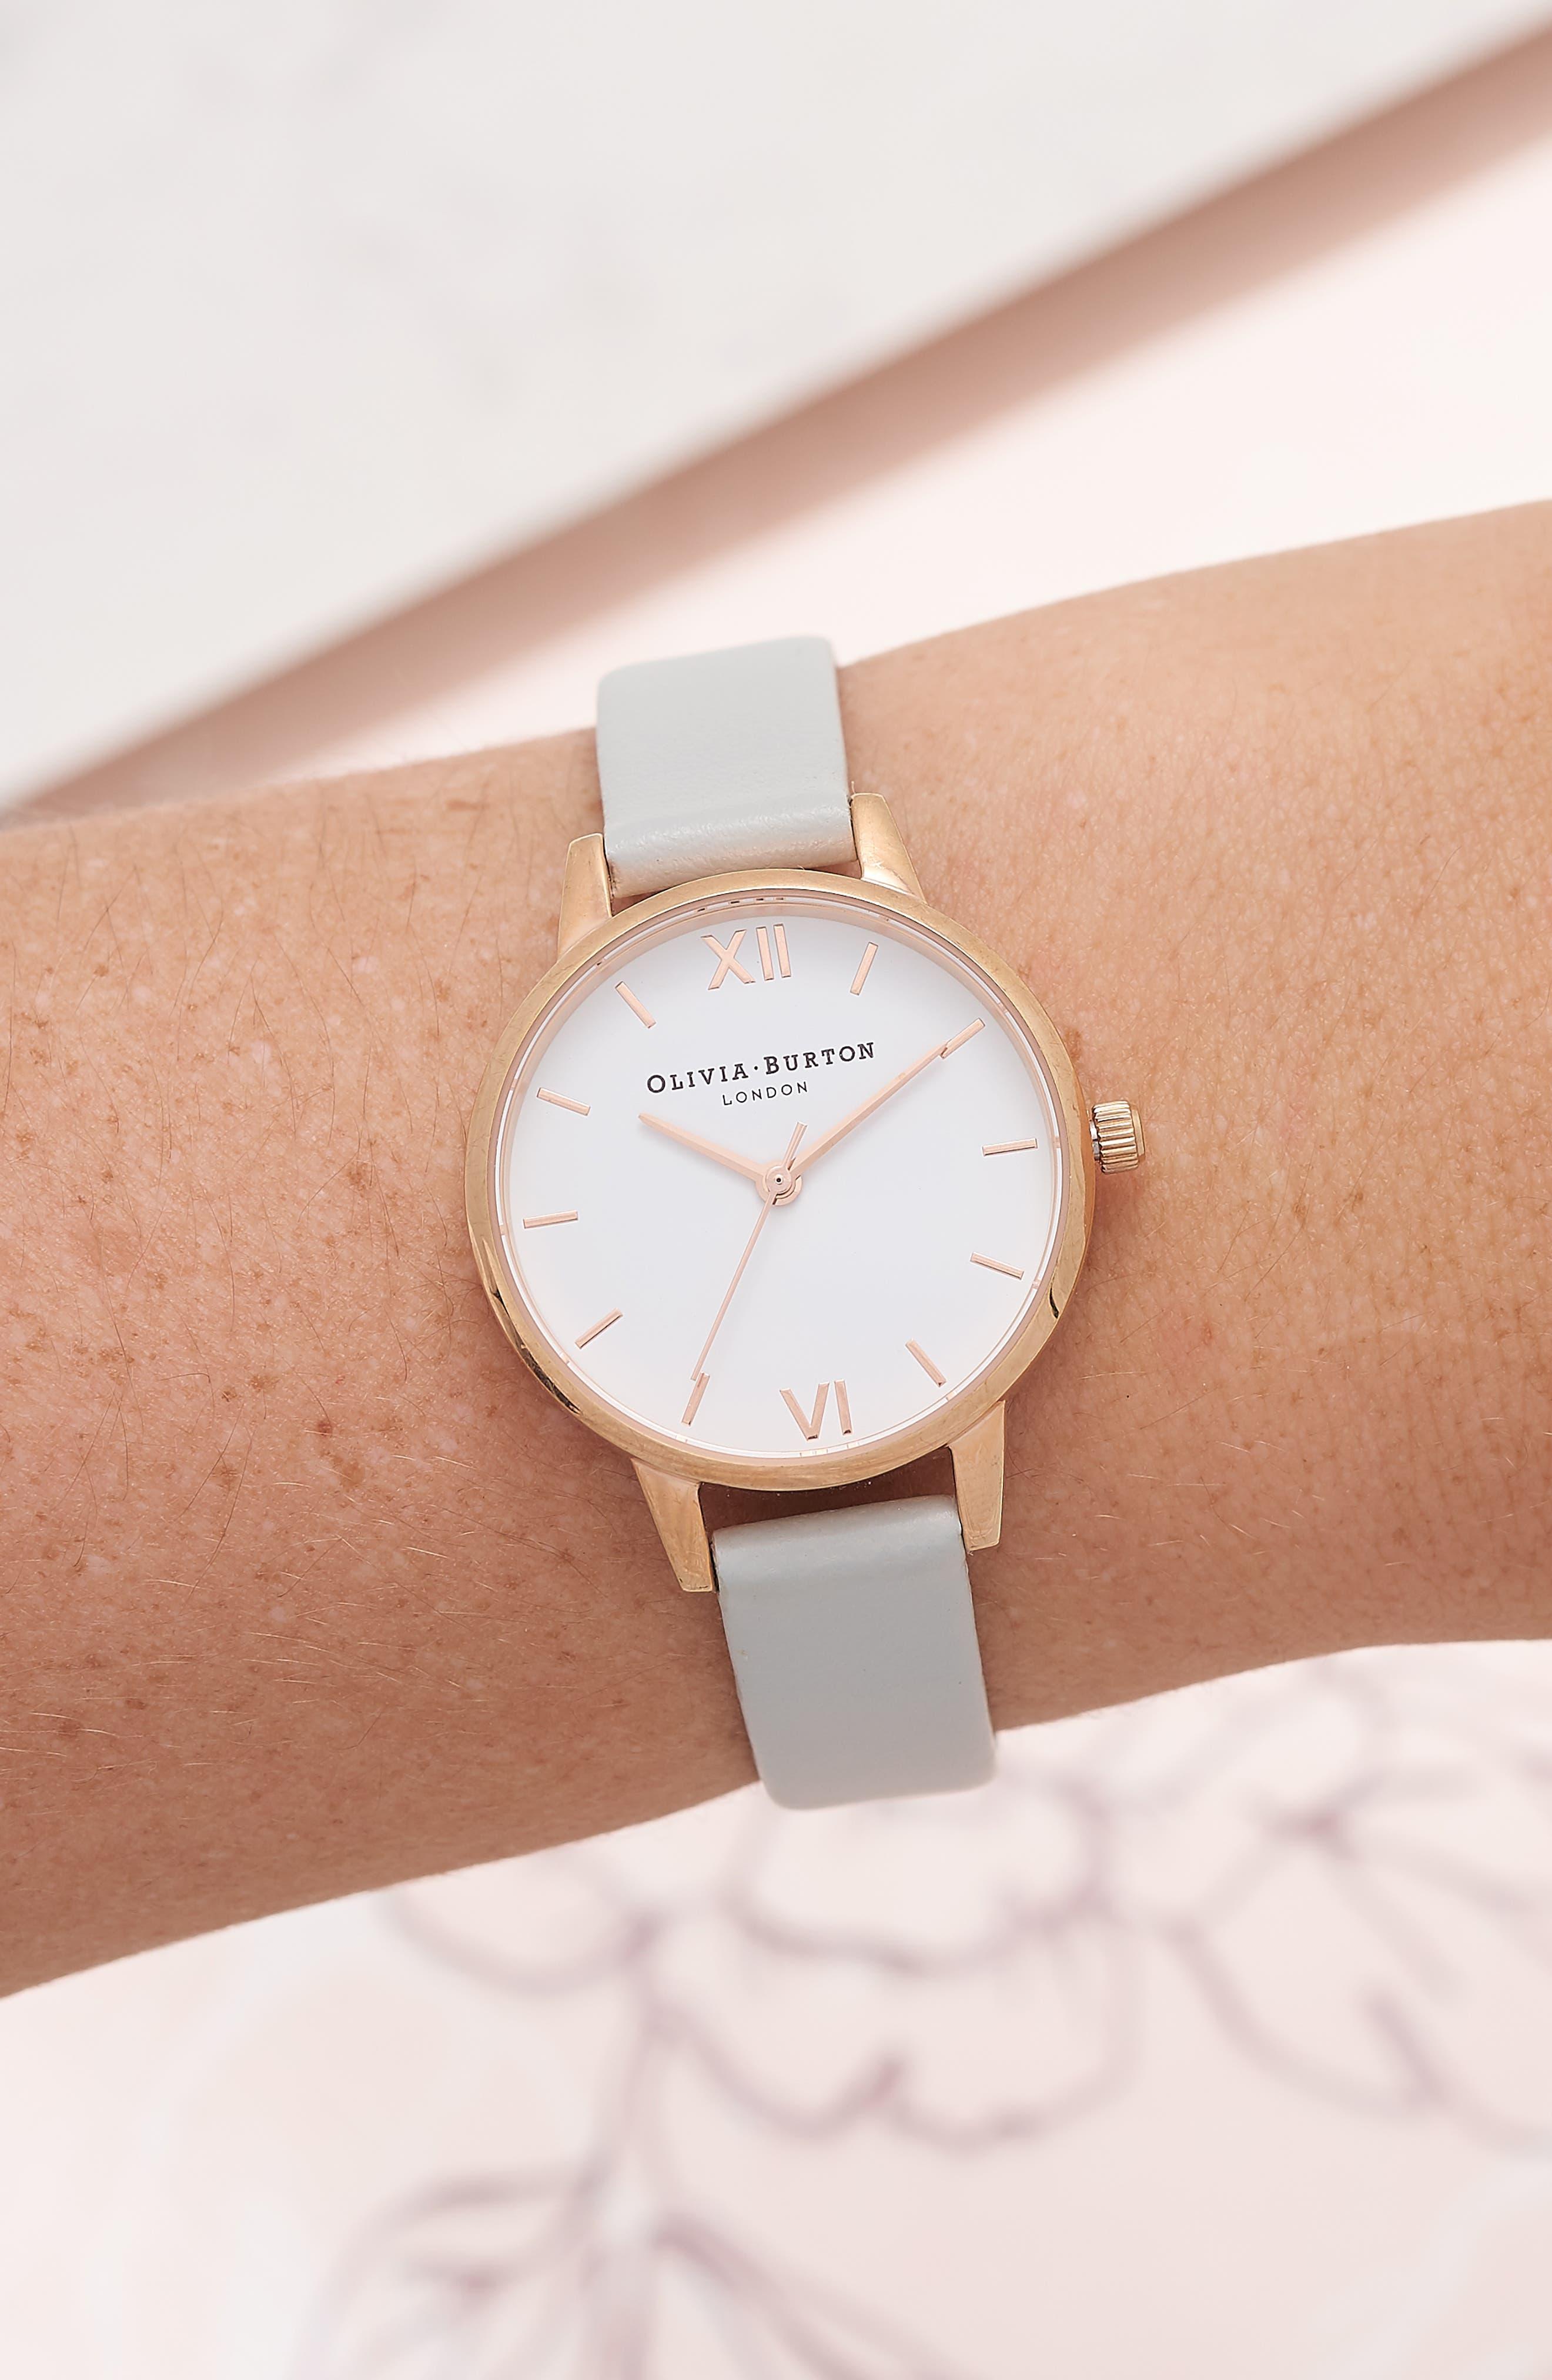 OLIVIA BURTON, Midi Dial Leather Strap Watch, 30mm, Alternate thumbnail 2, color, GREY/ WHITE/ ROSE GOLD